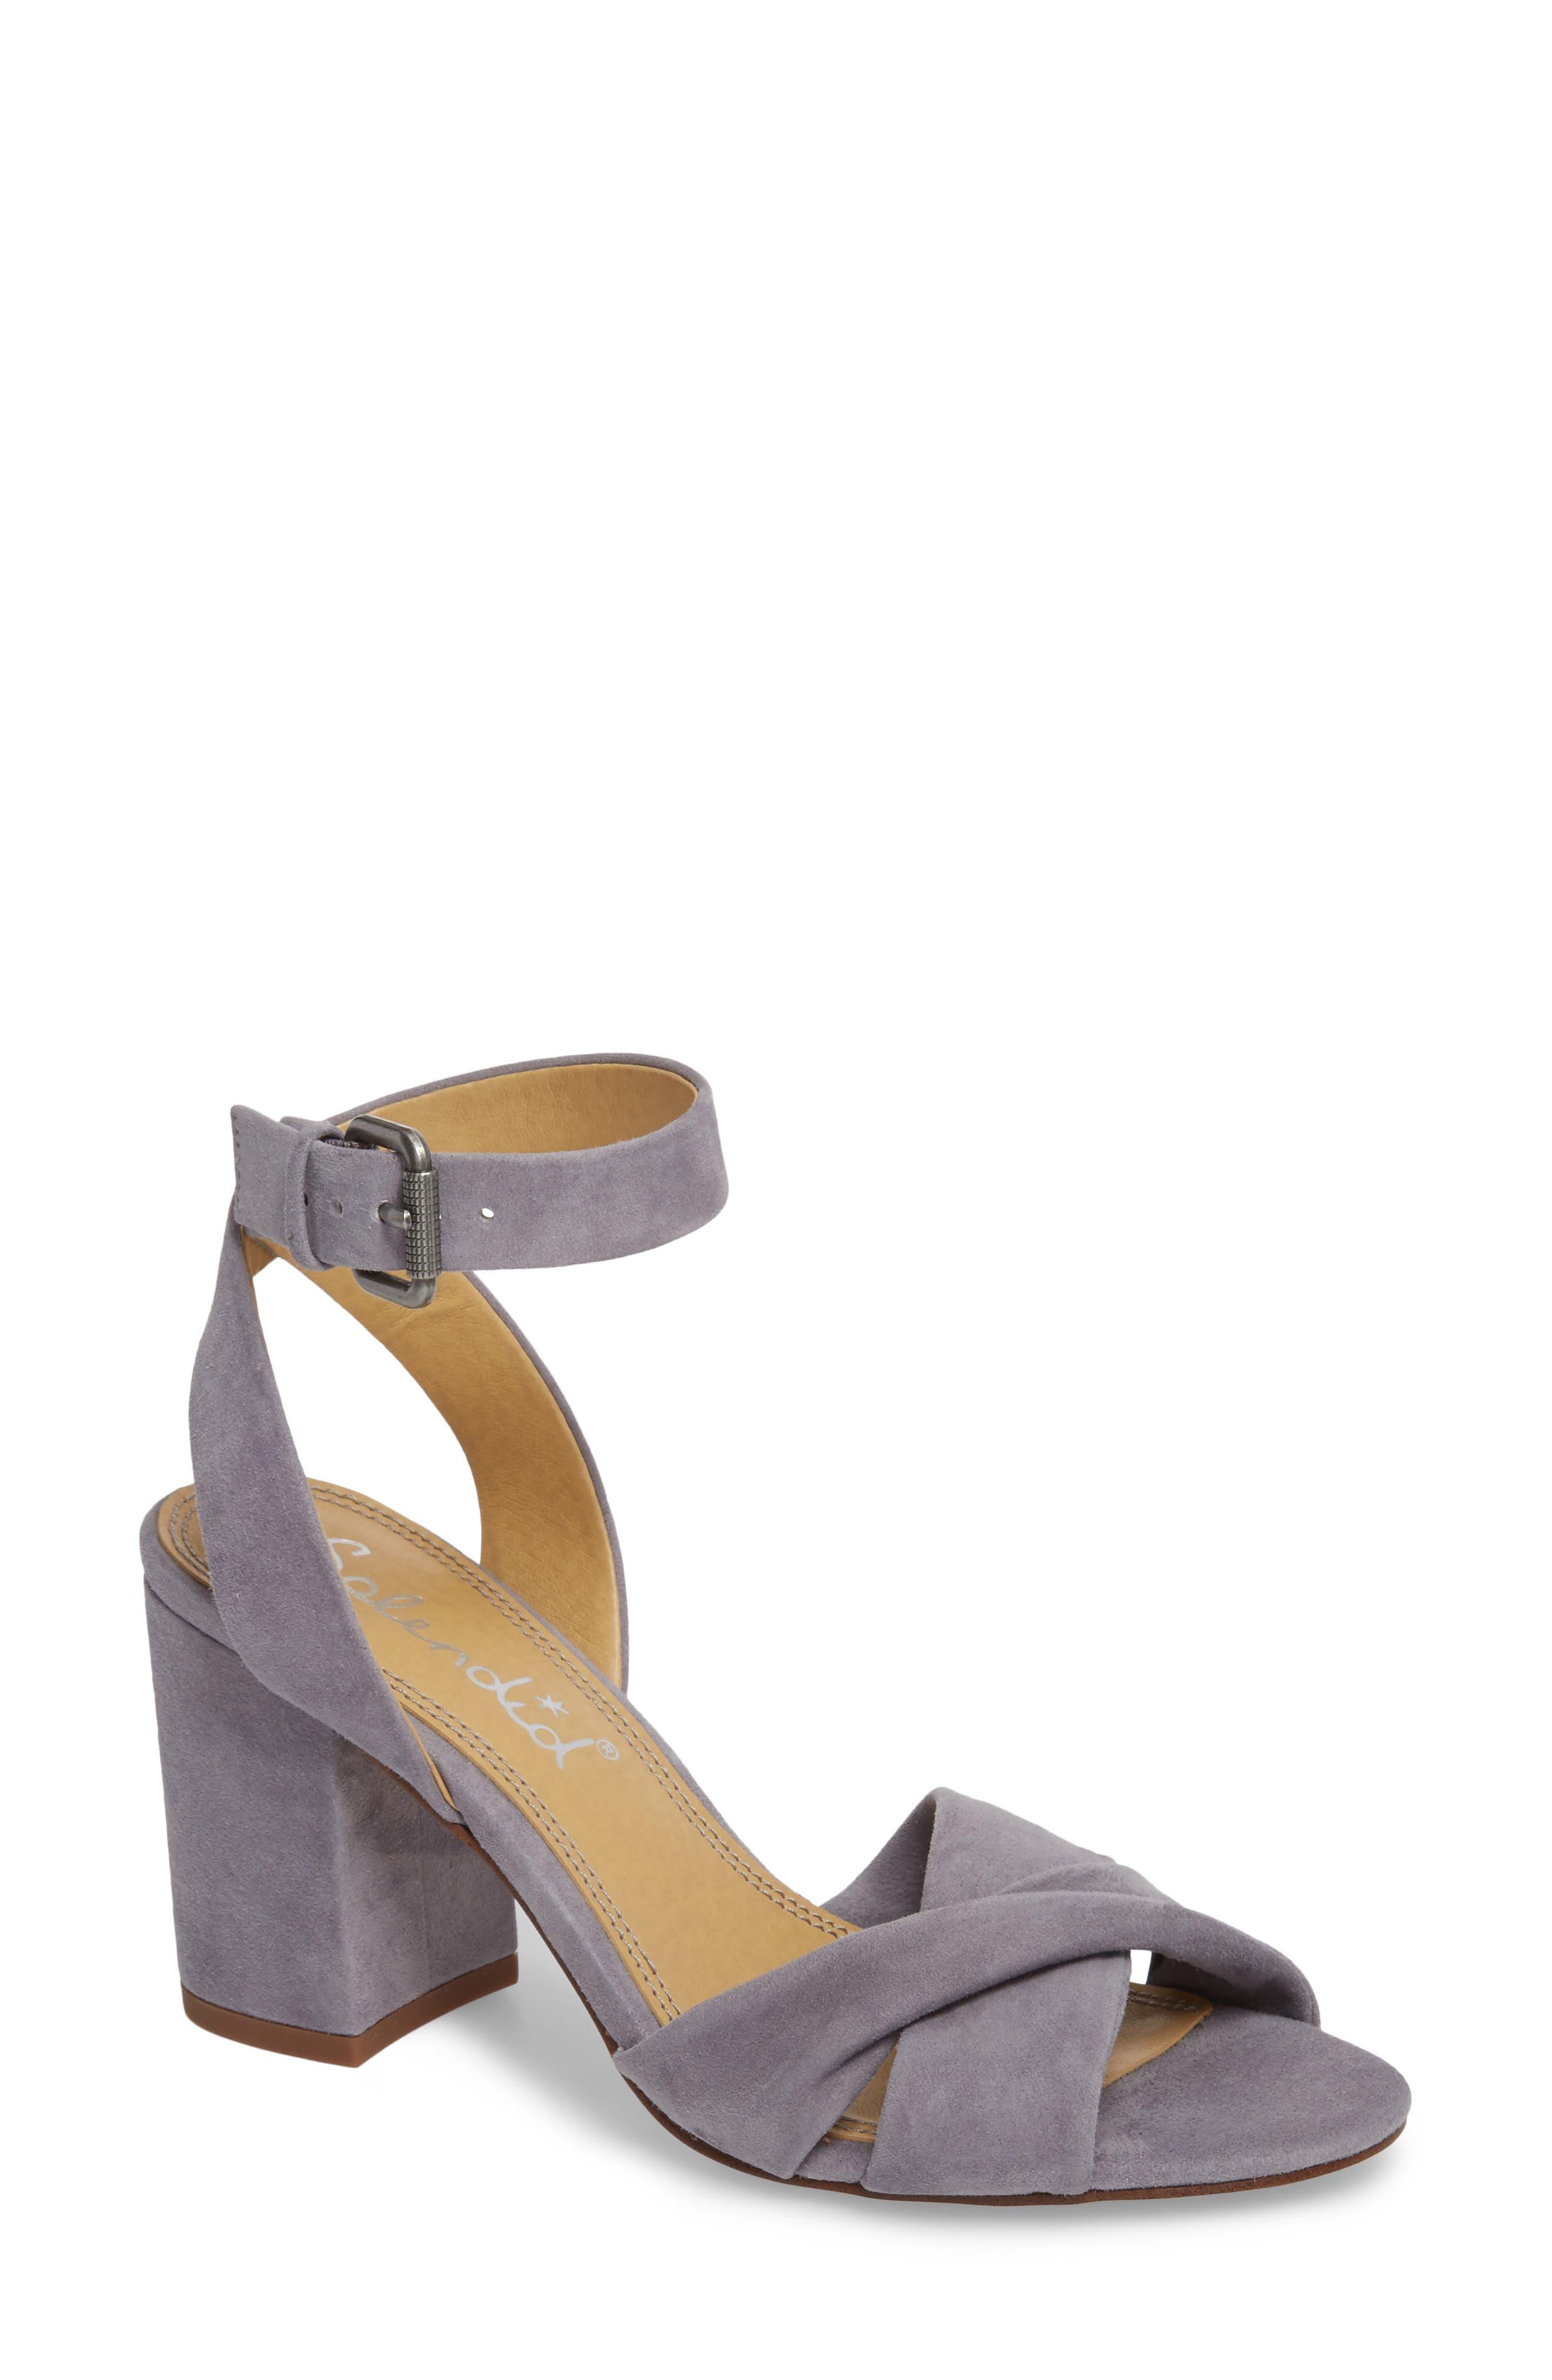 Fairy Block Heel Sandal,                         Main,                         color, STEEL GREY SUEDE